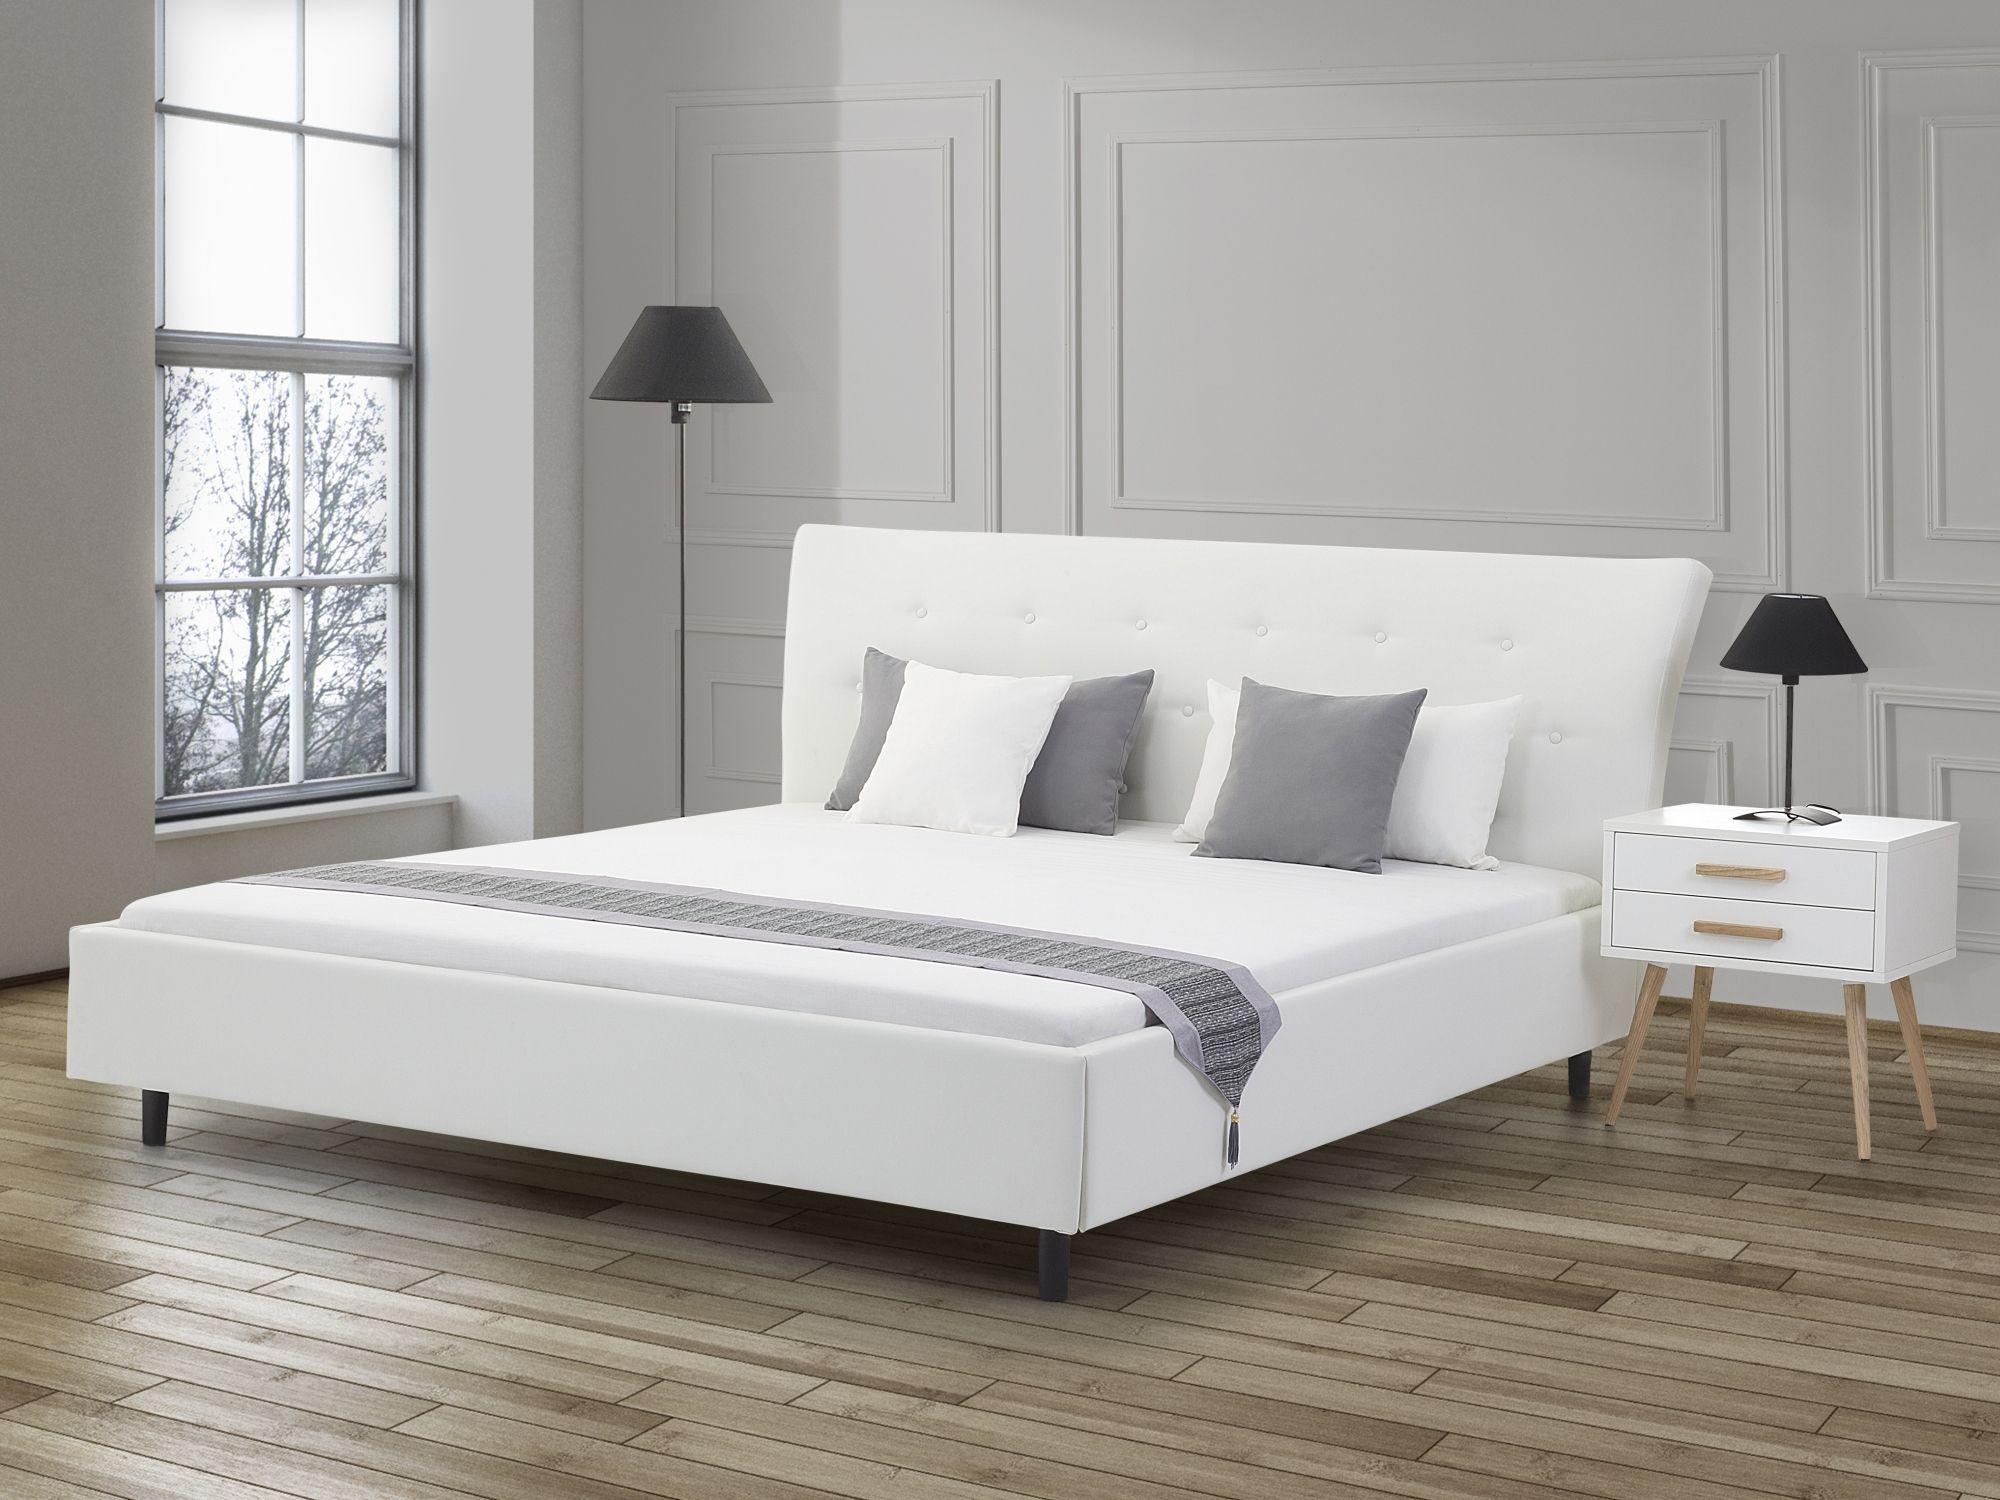 Faux Leather EU King Size Bed White SAVERNE (con immagini